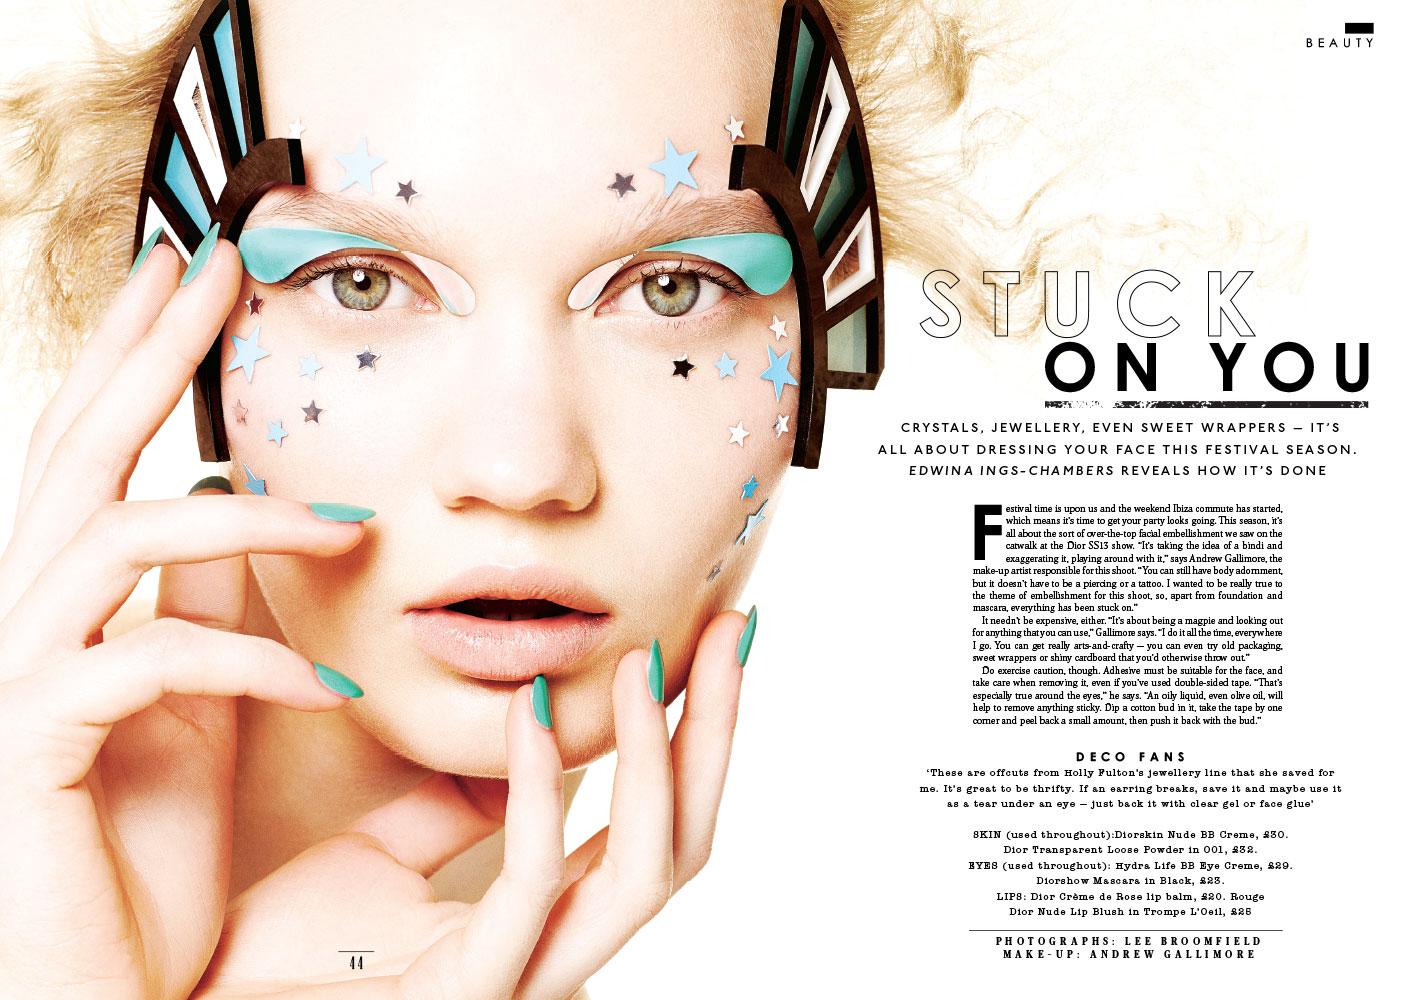 Nova Malanova Sunday Times Style Lee Broomfield 02